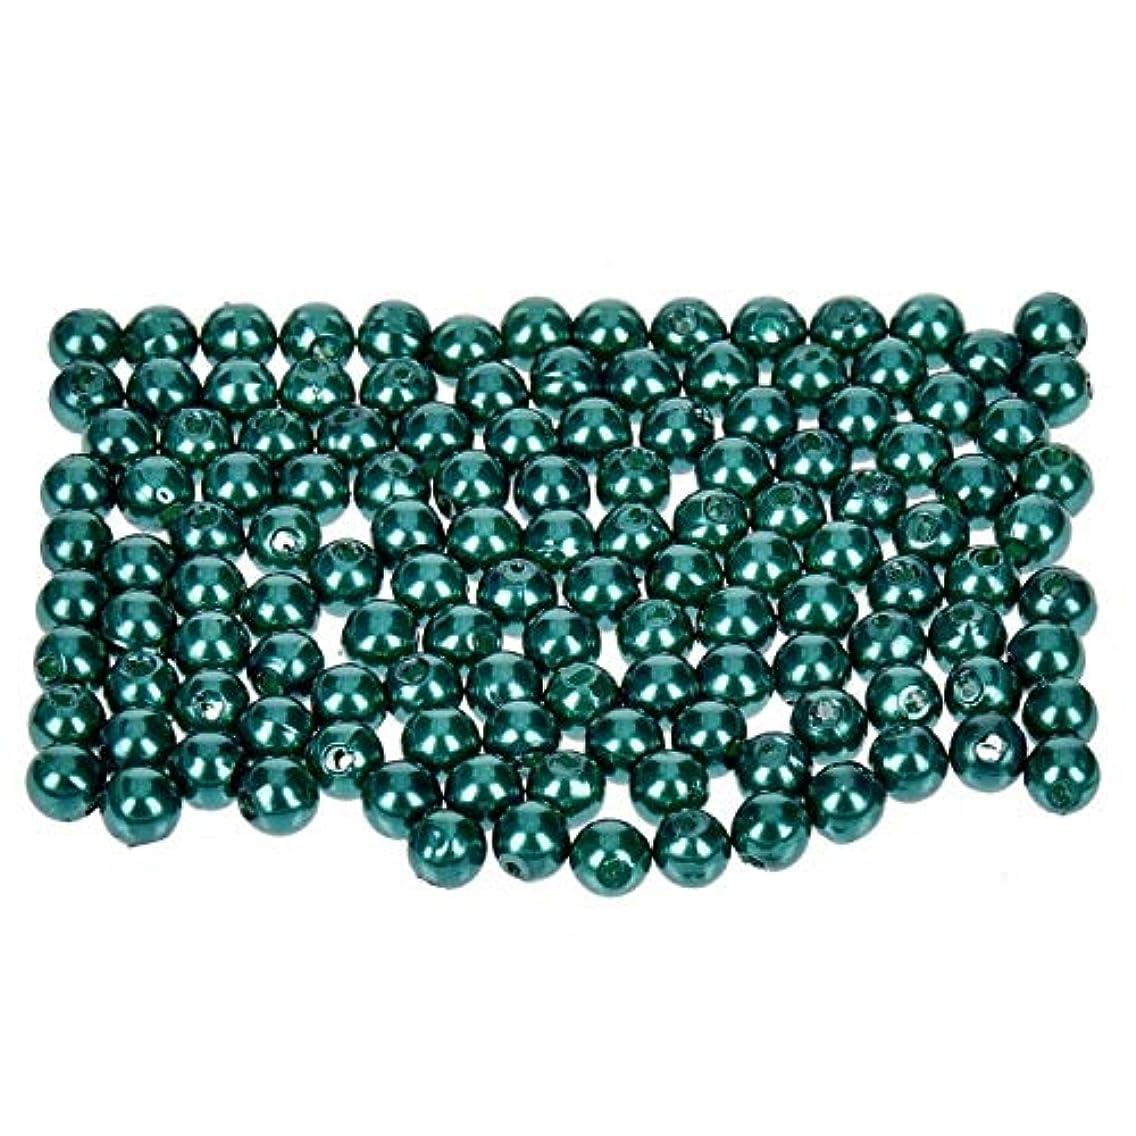 Efco Wax Beads, Plastic, Green, 4 mm Diameter, 125-Piece